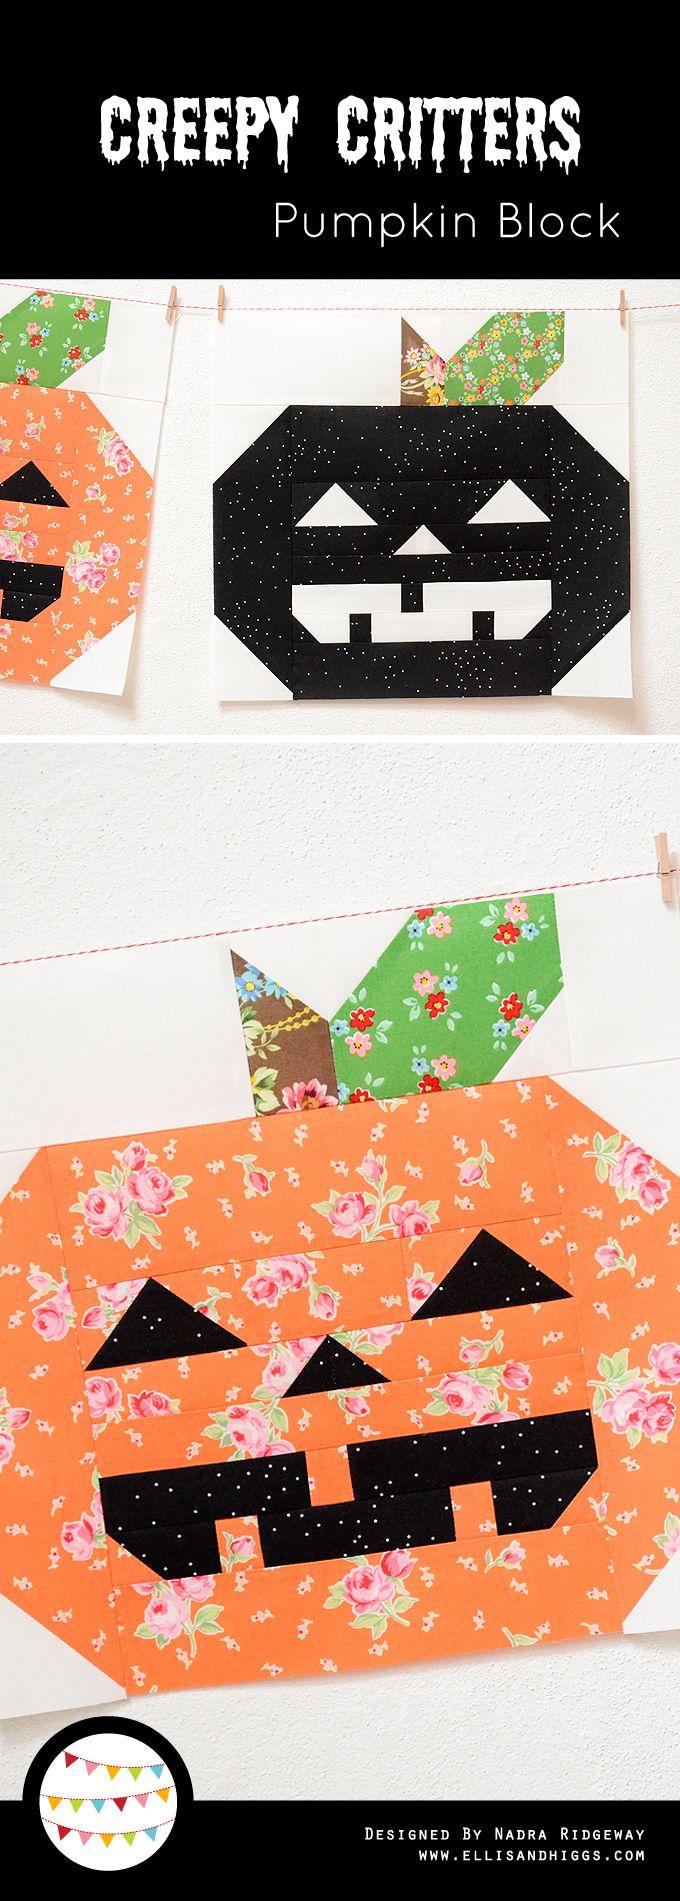 Creepy Critters Pumpkin Quilt Block by ellis & higgs